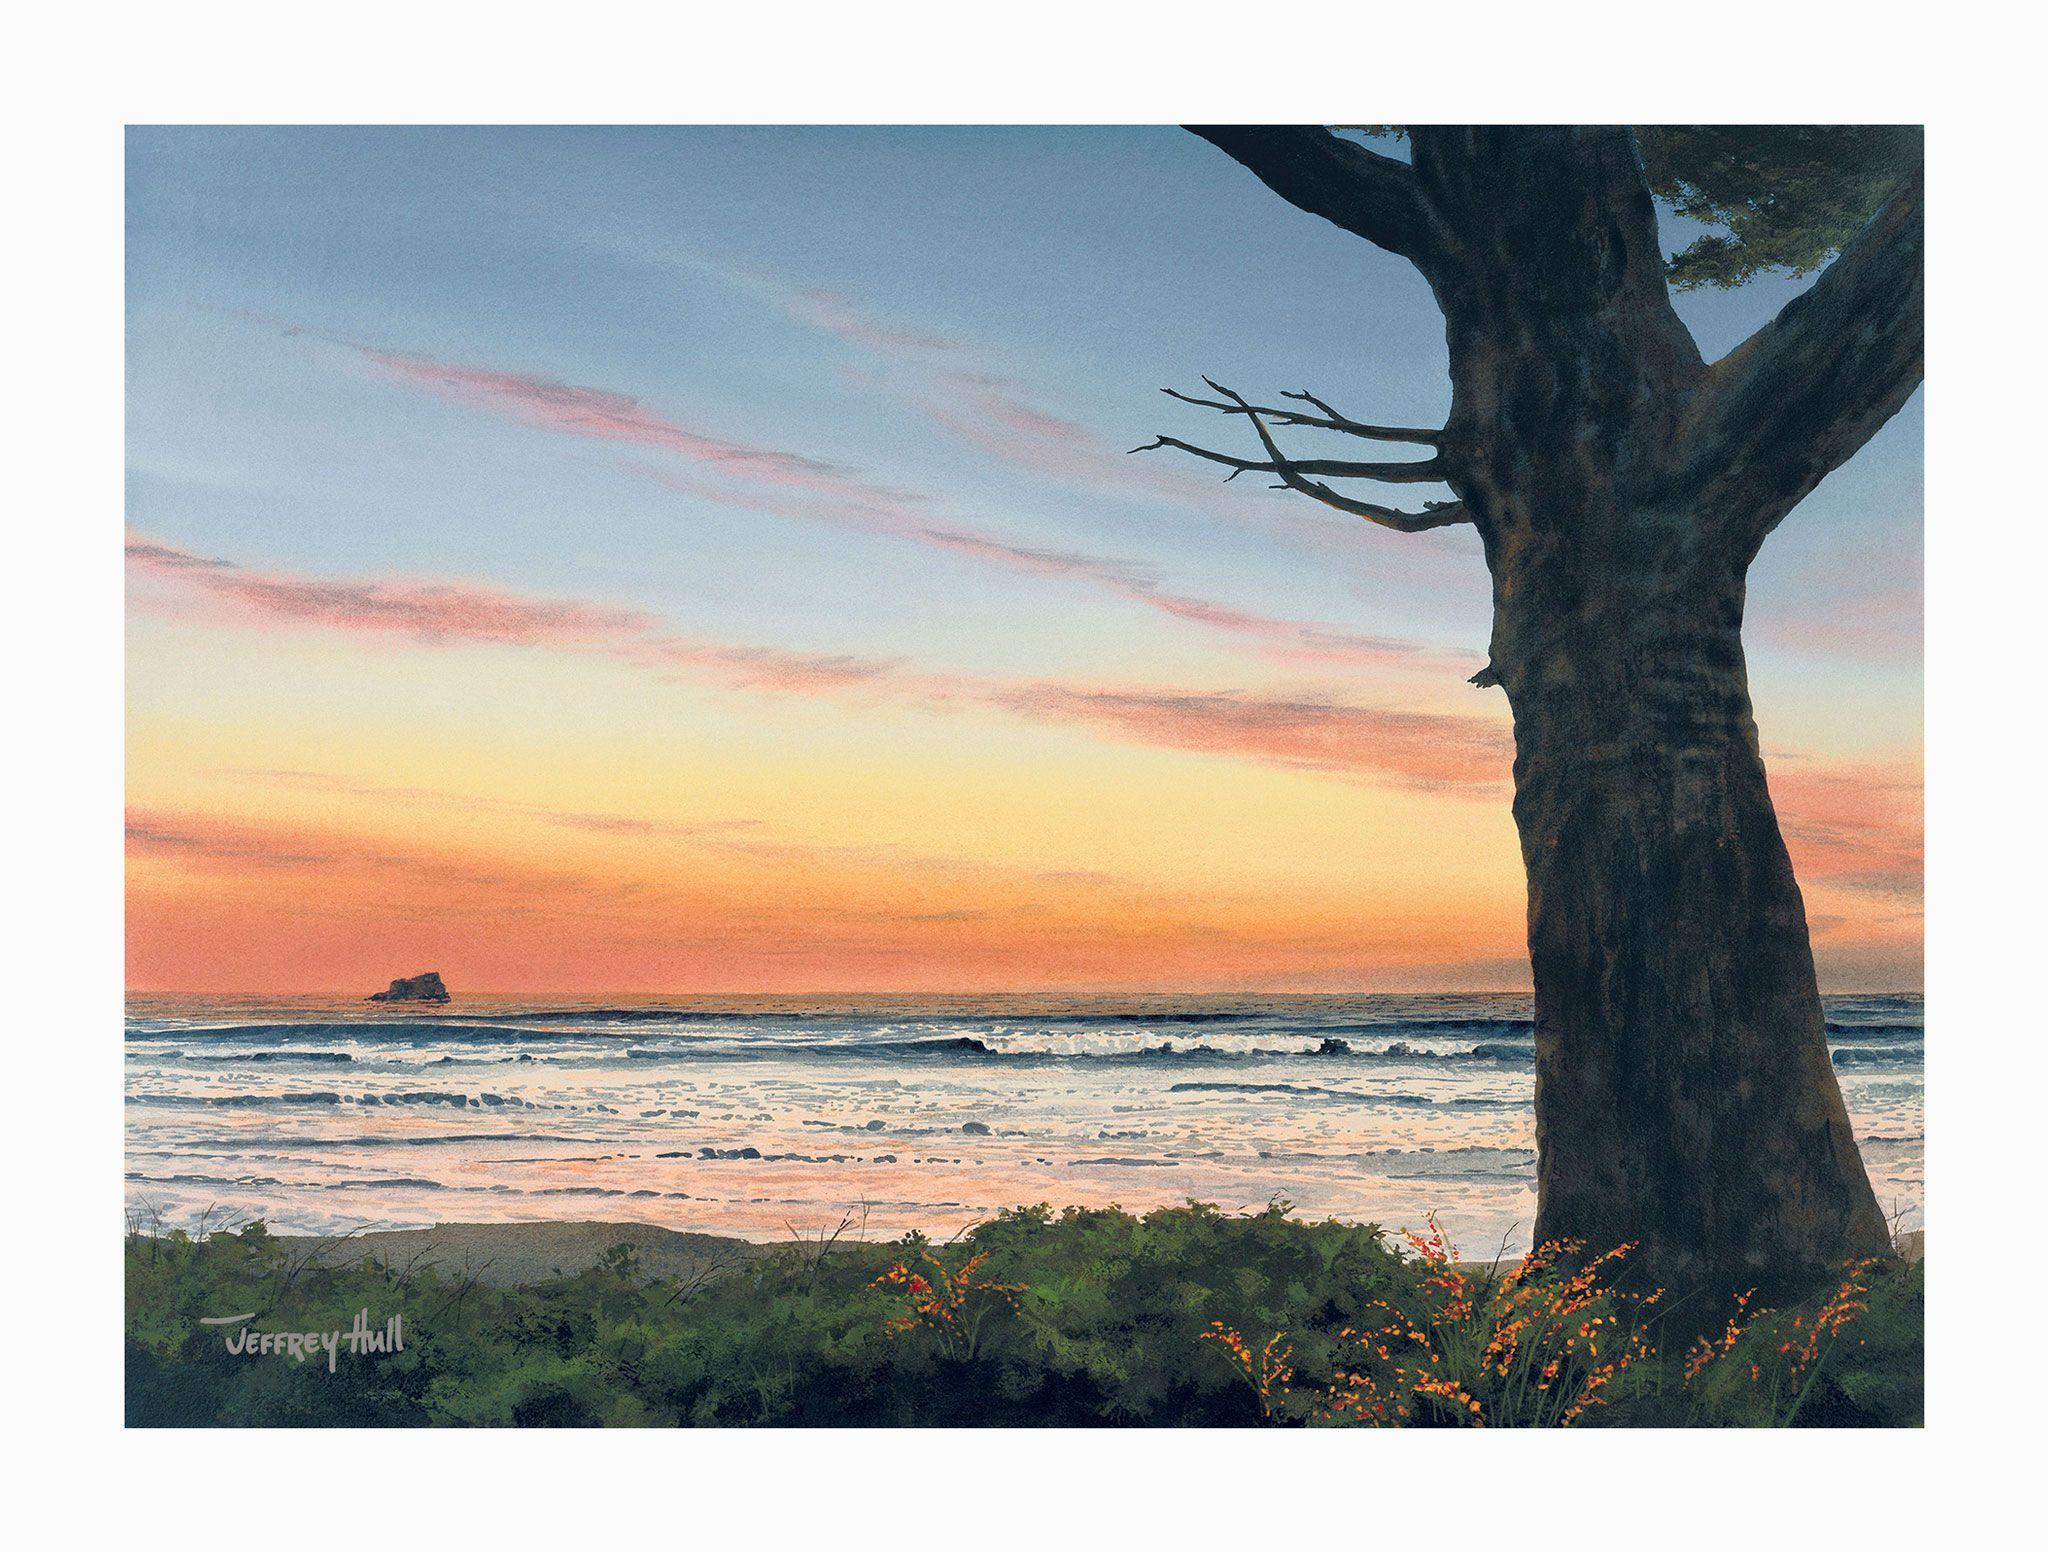 Sunset-Overlook-OpenEd-Unframed-4-Website-2021